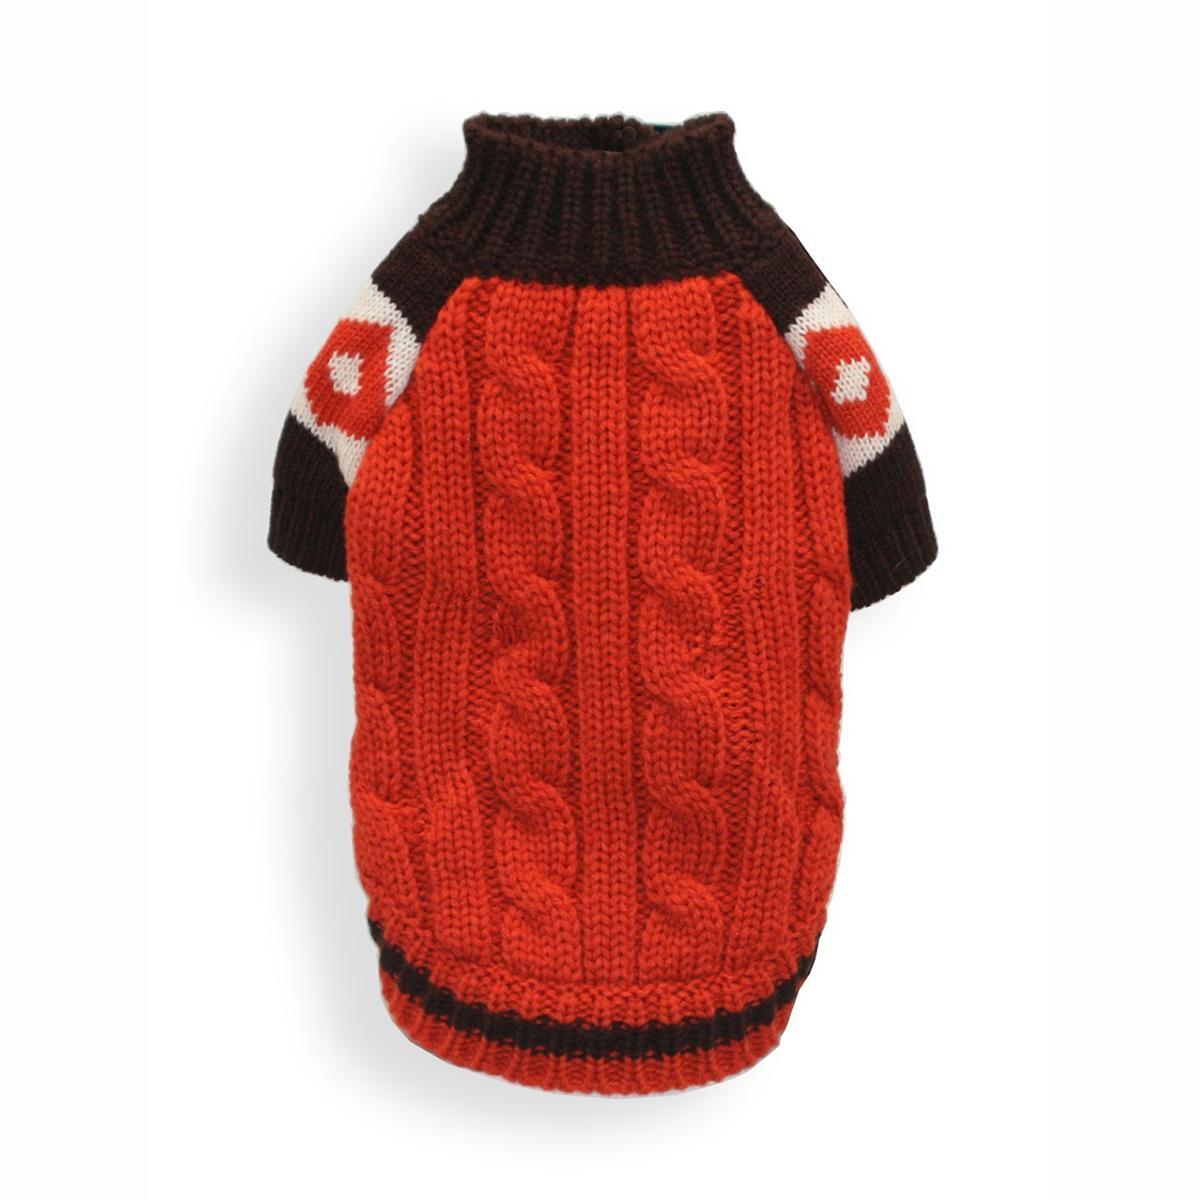 Ski Lodge Dog Sweater by Hip Doggie - Orange